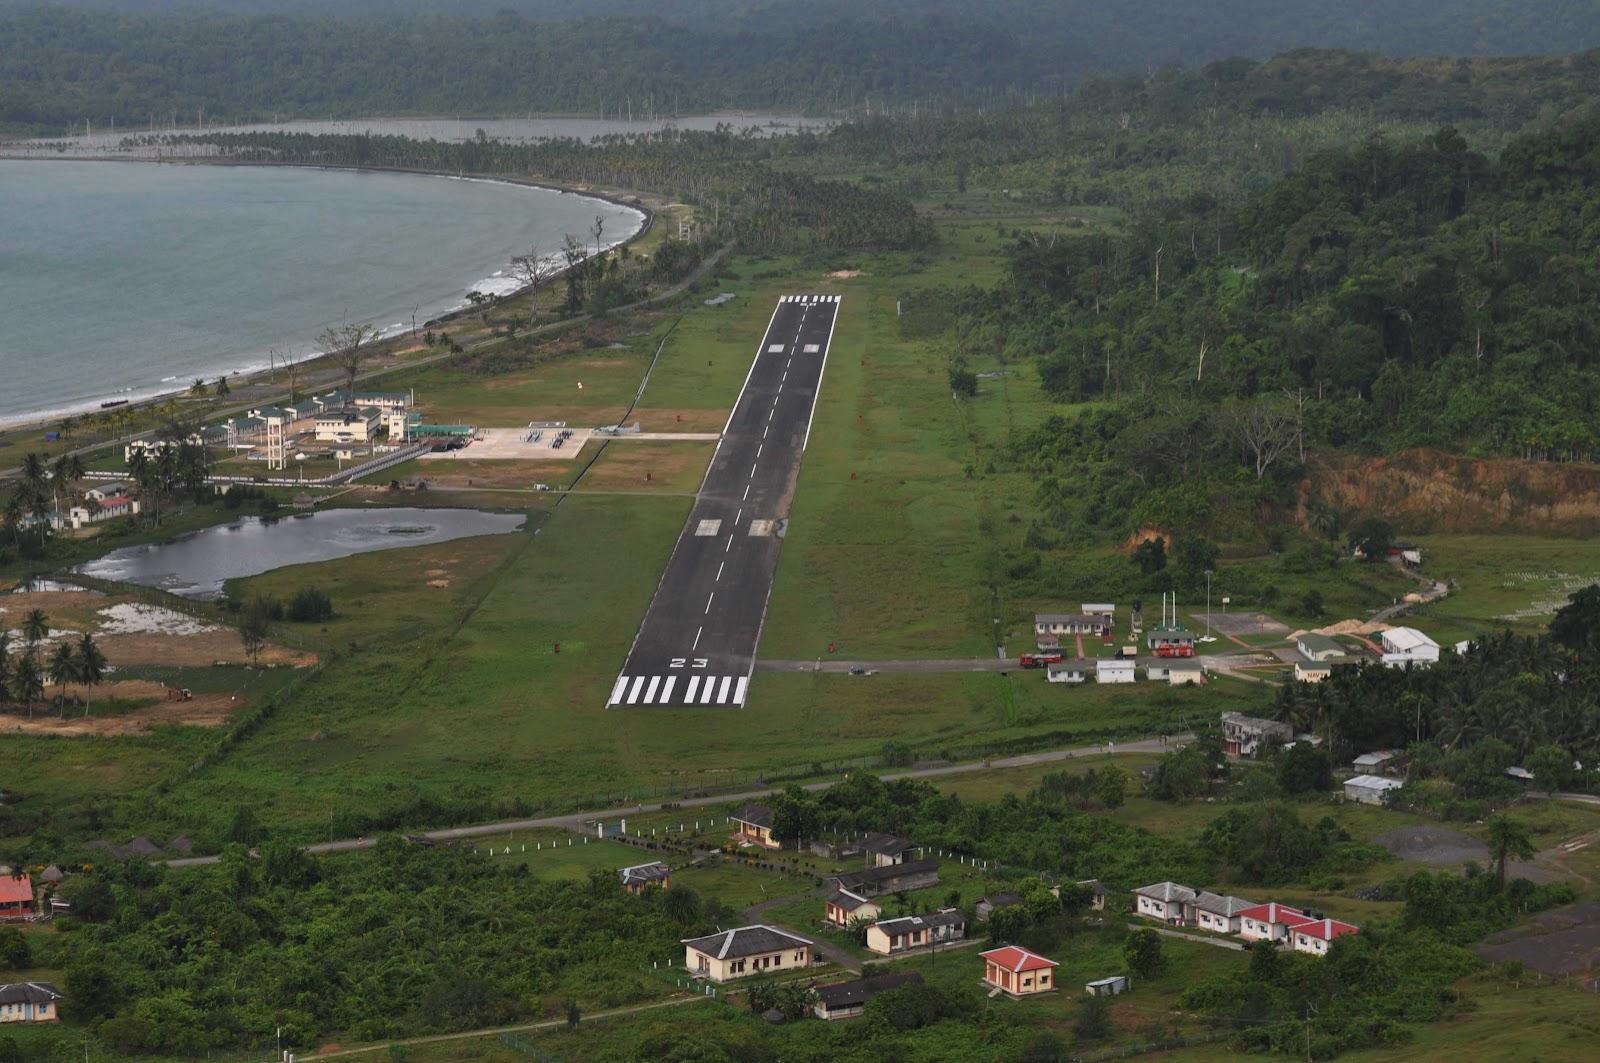 Nicobar islands airport